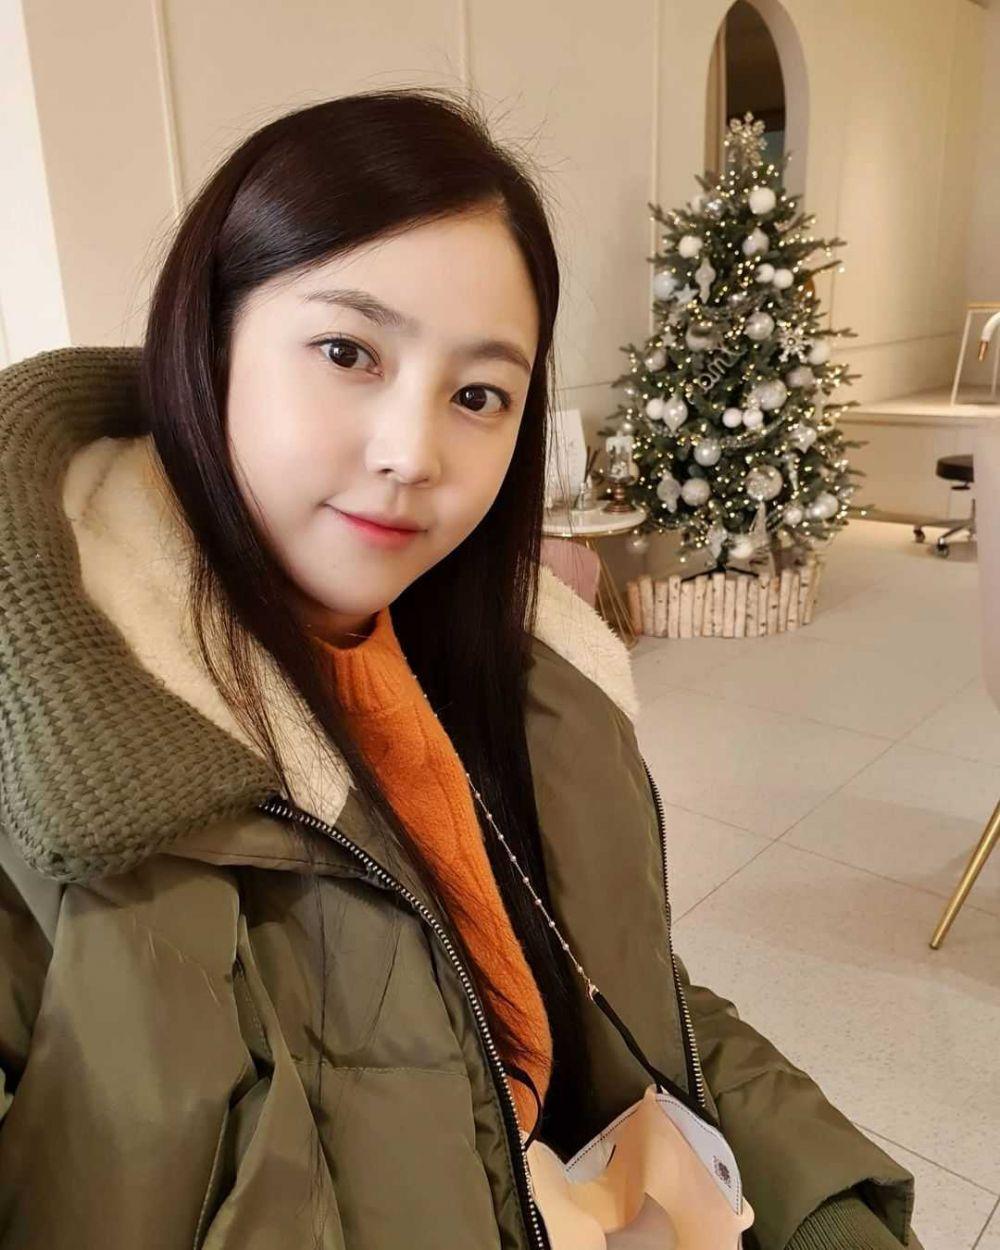 Populer di Miss Trot 2, 10 Potret Kim Sa Eun yang Makin Flawless!